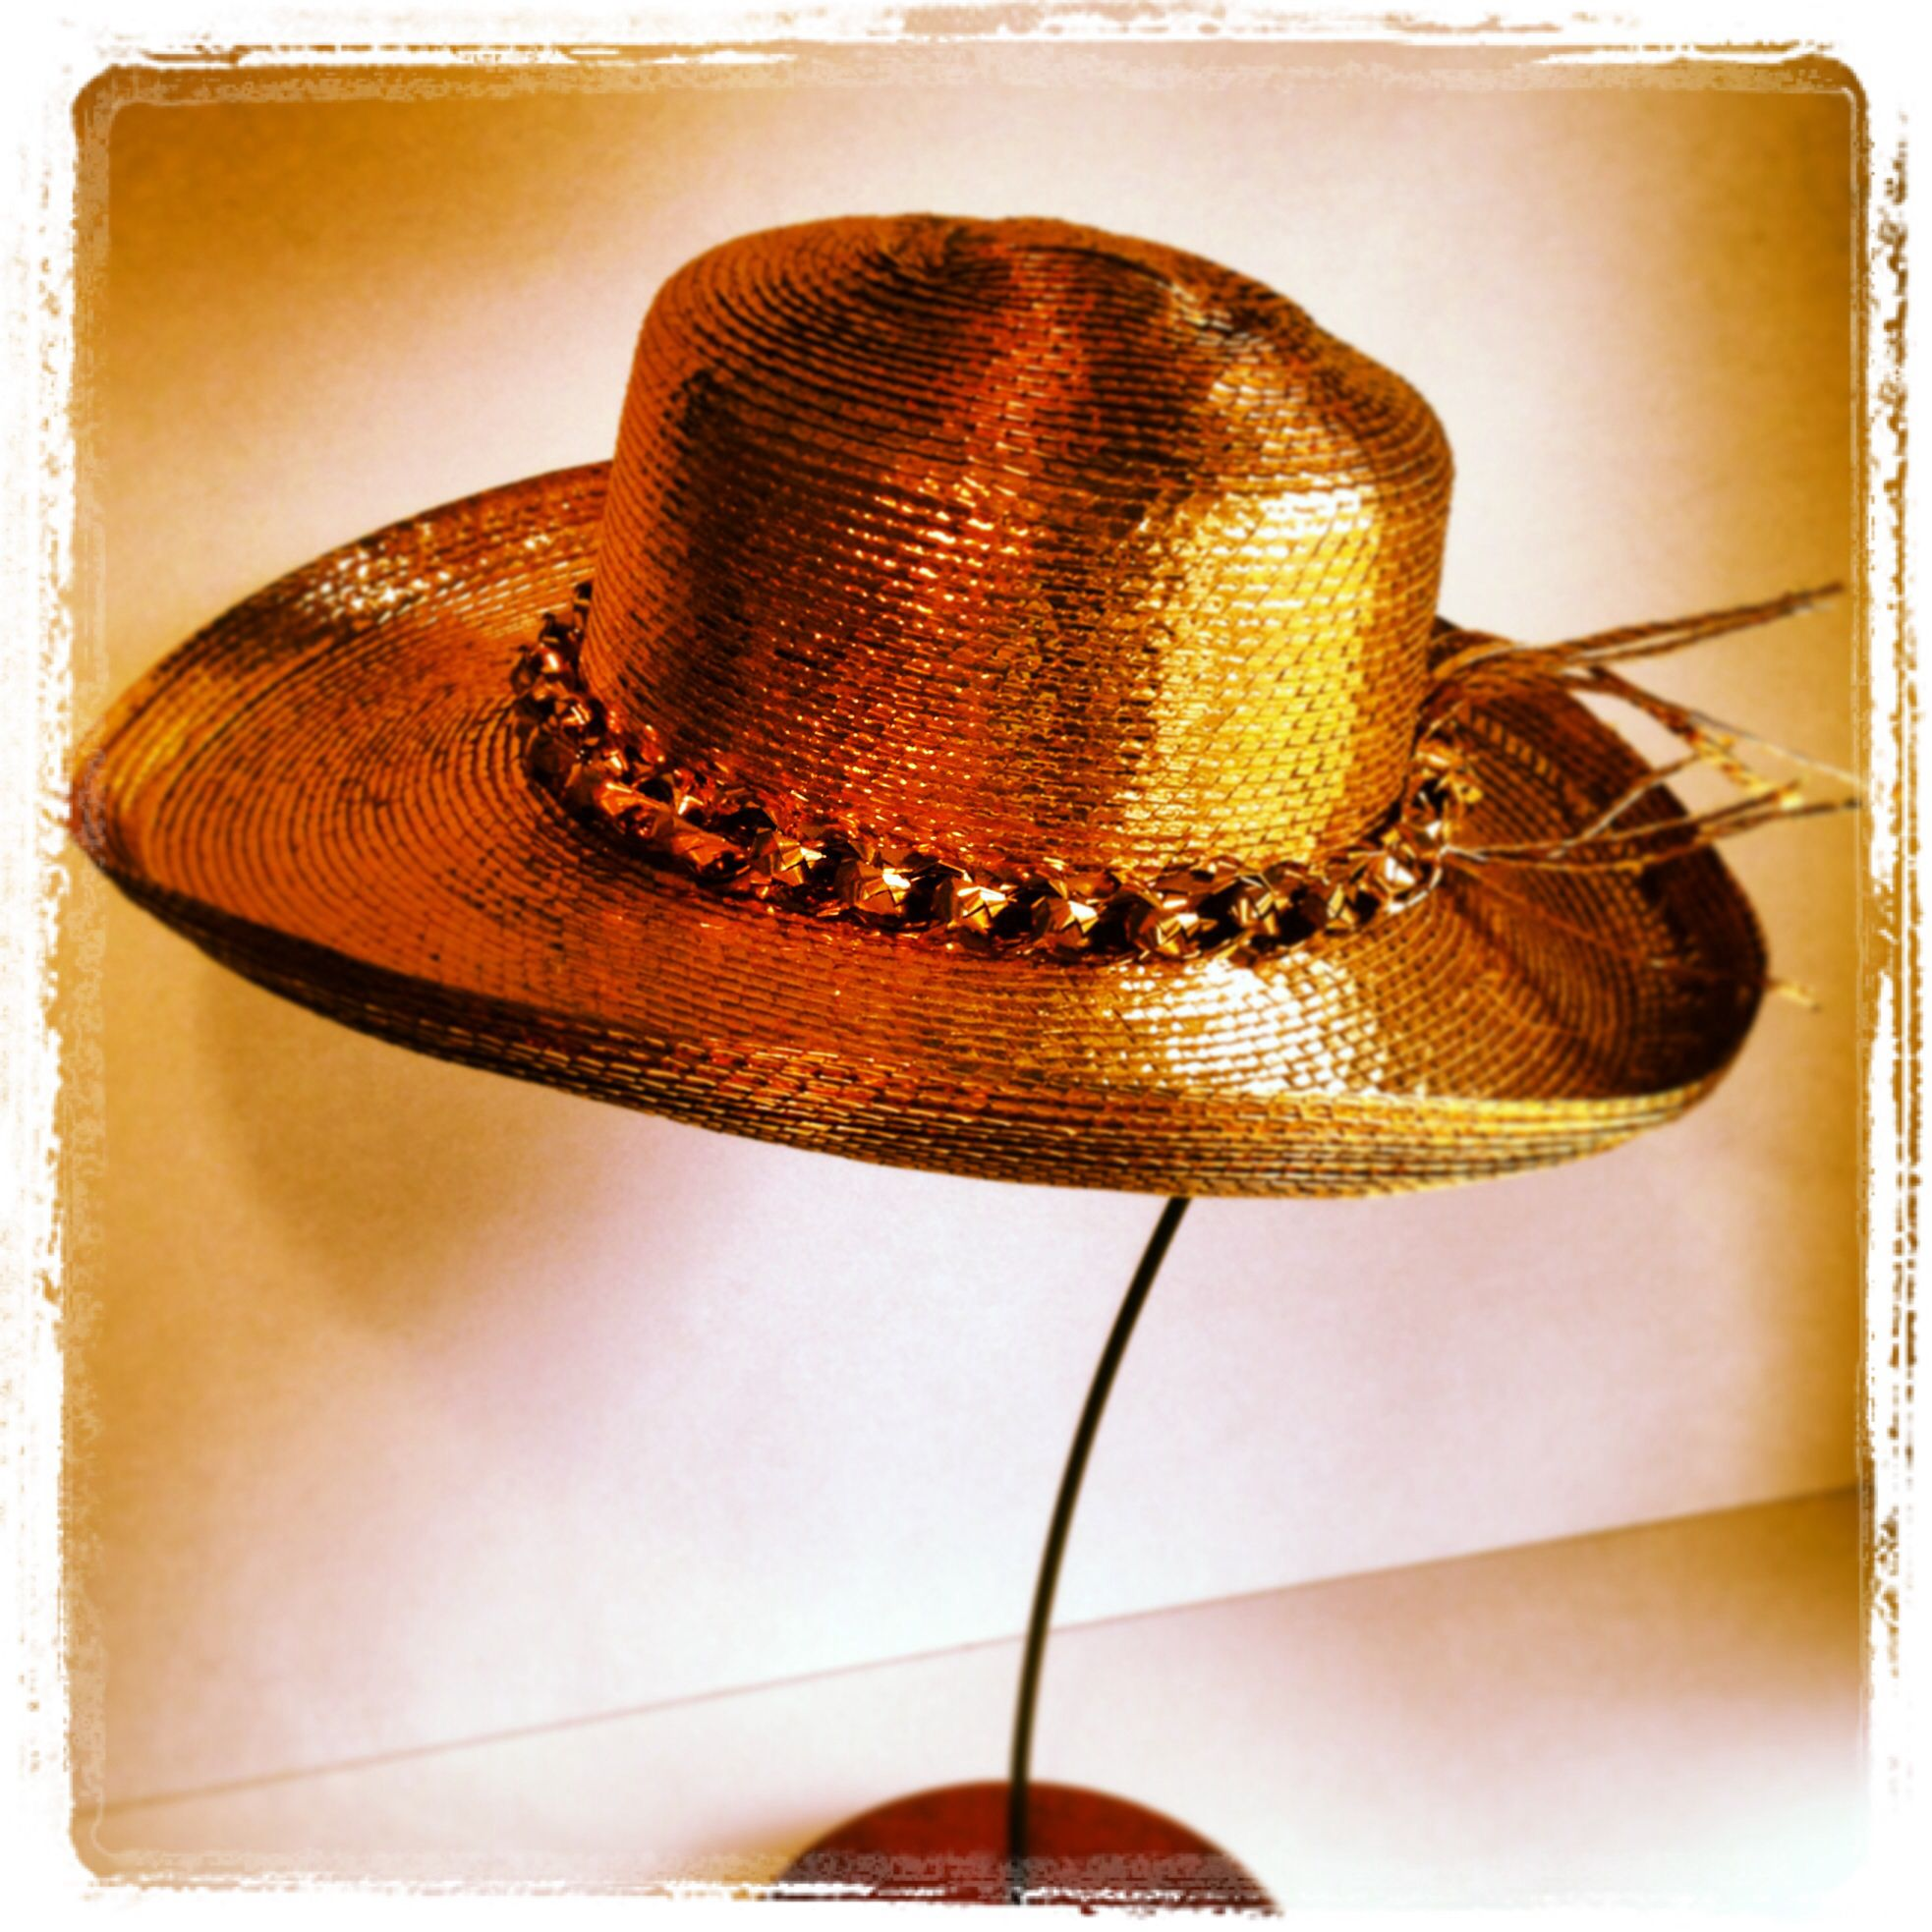 9c62df2d9 Vintage Frank Olive Cowboy Hat on Gold for Neiman Marcus   Hats ...